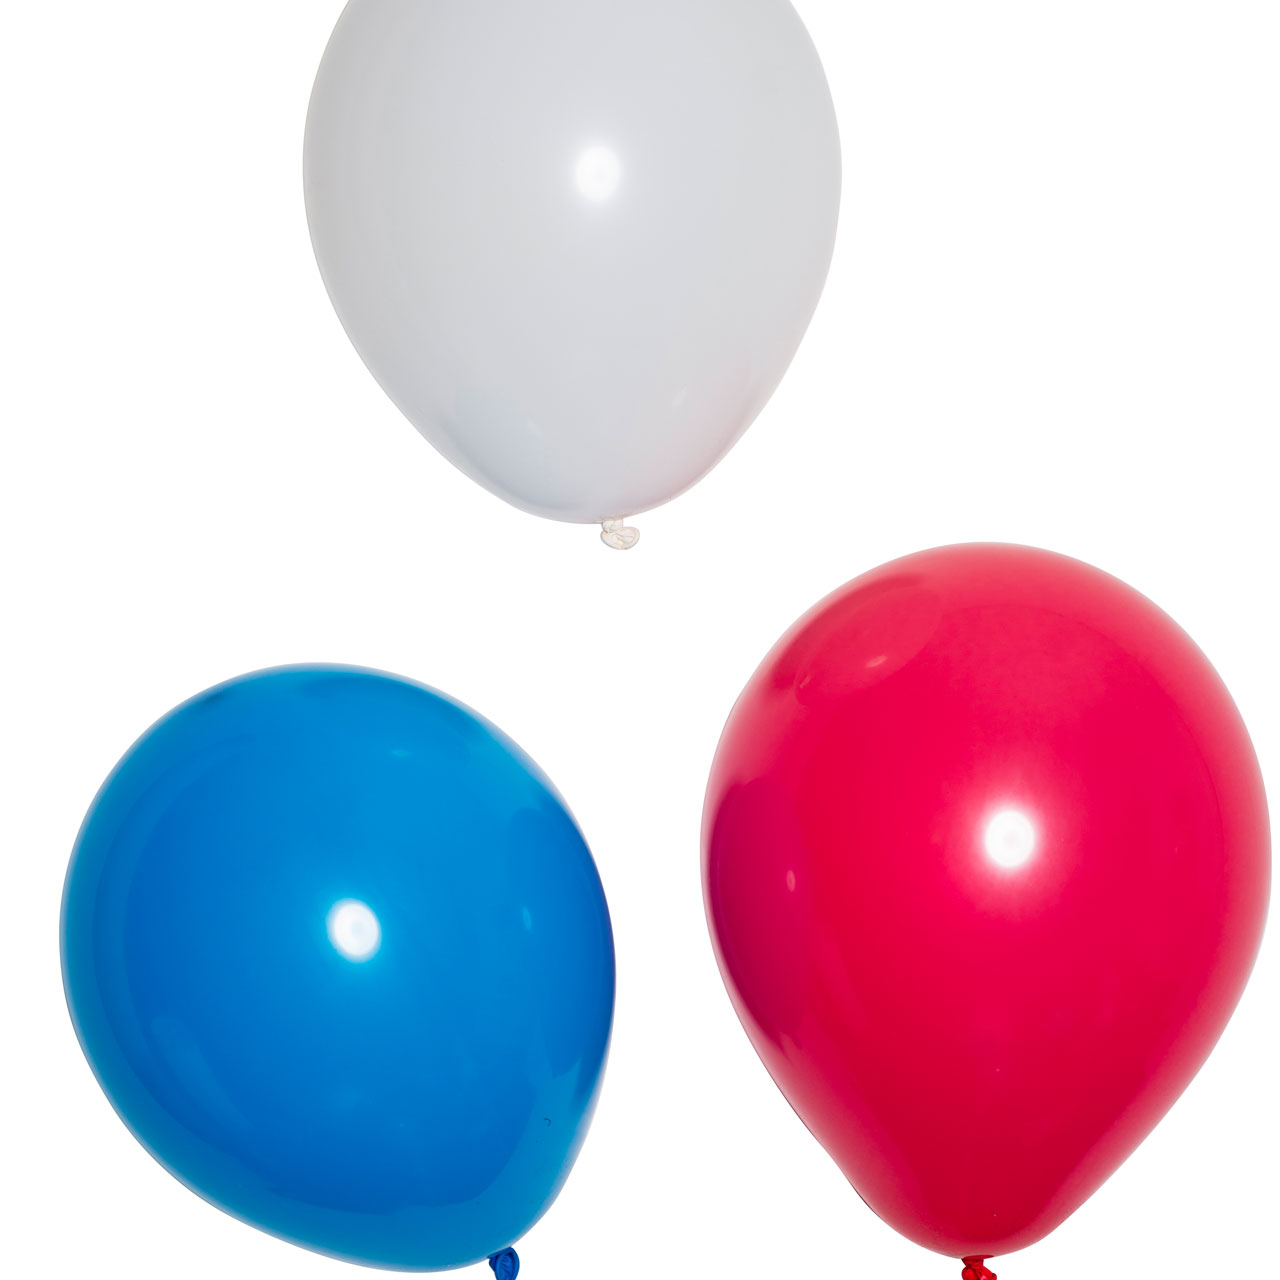 Luftballons, Weiß-blau-rot